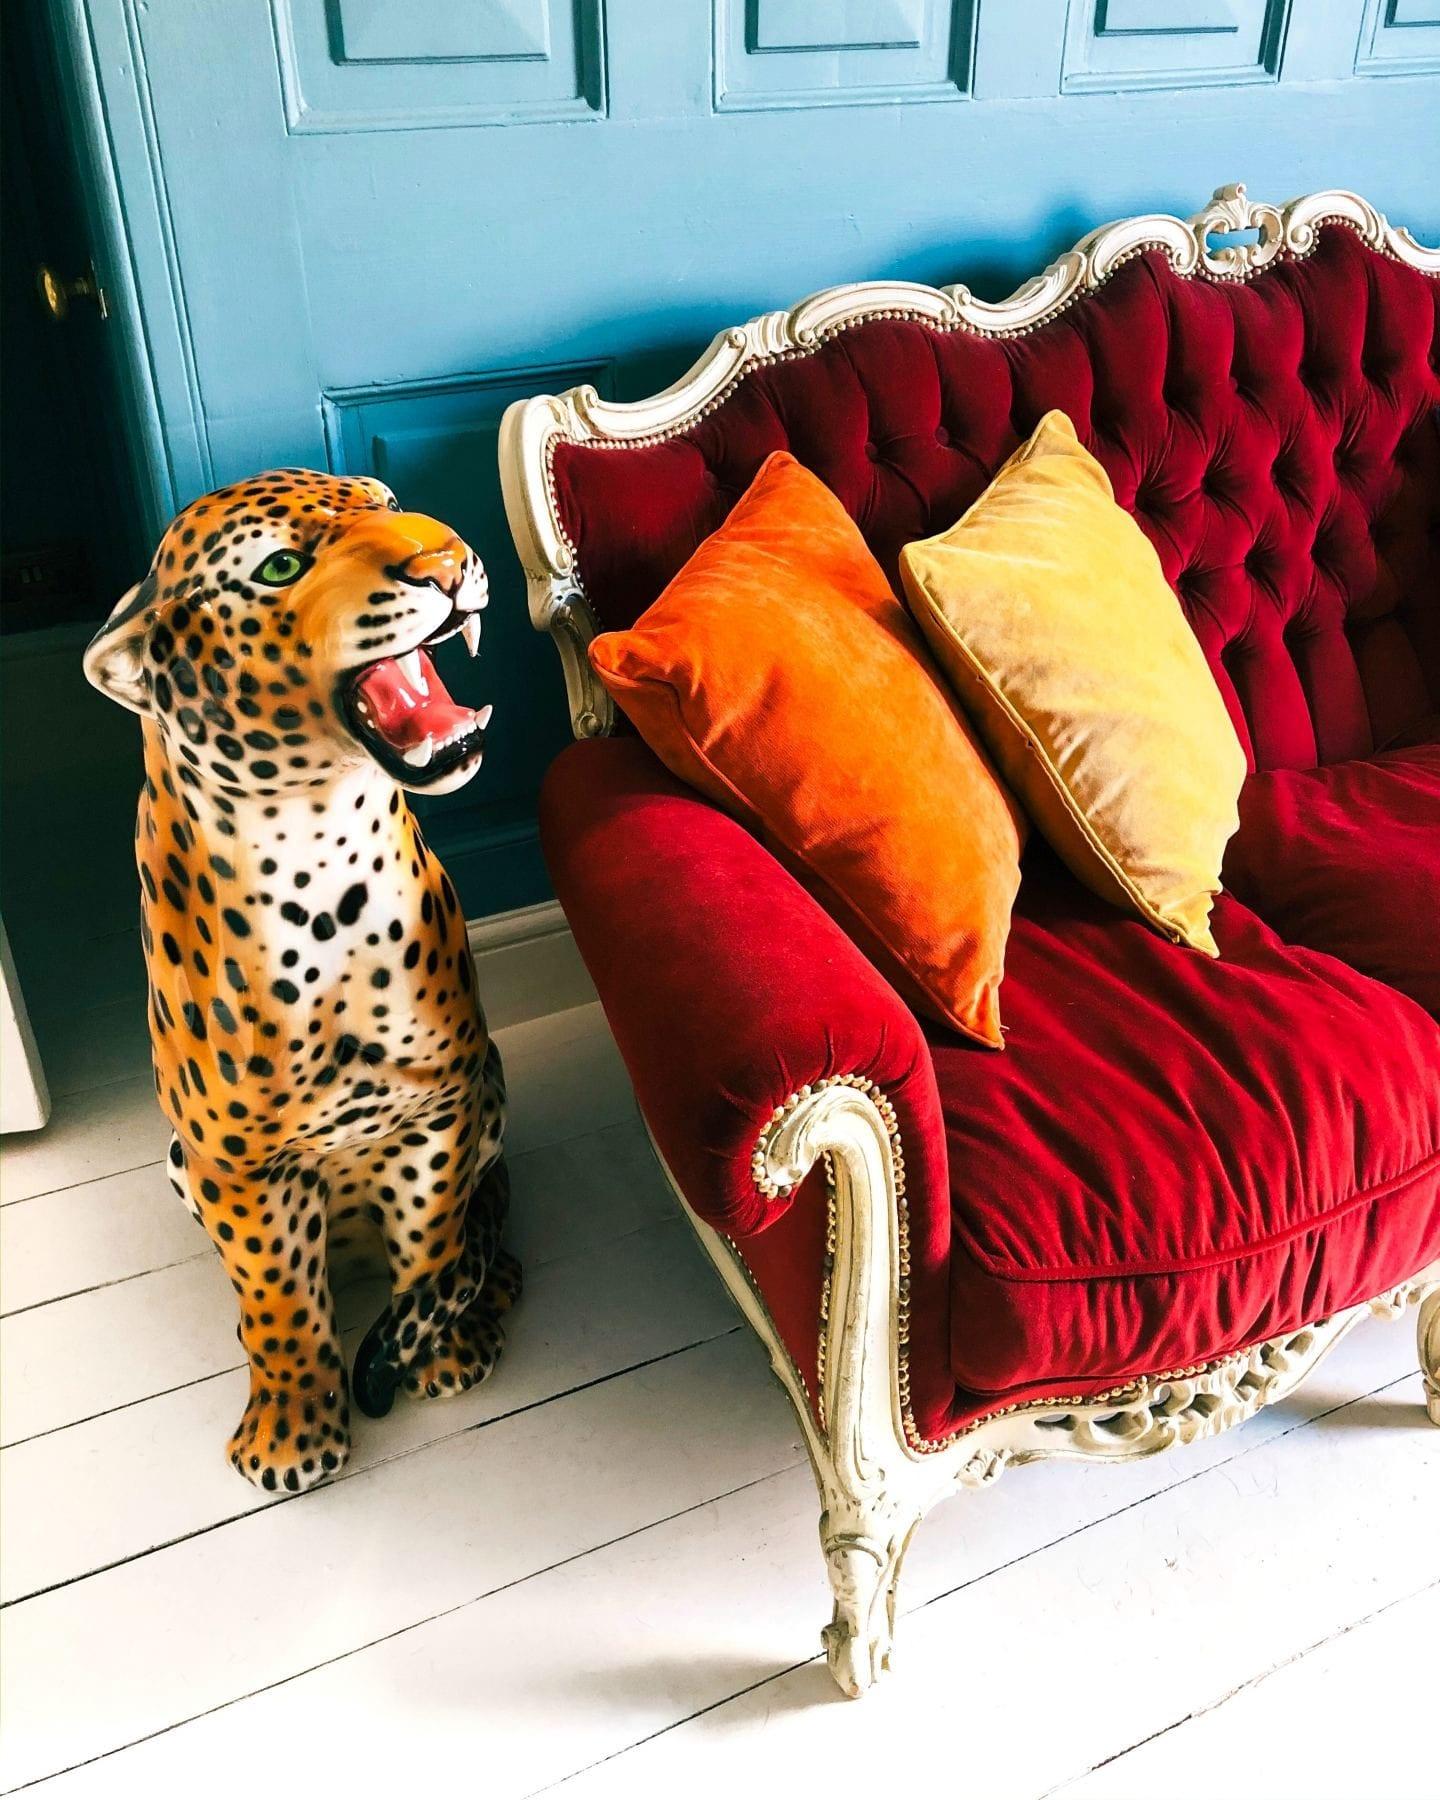 leopard figurines